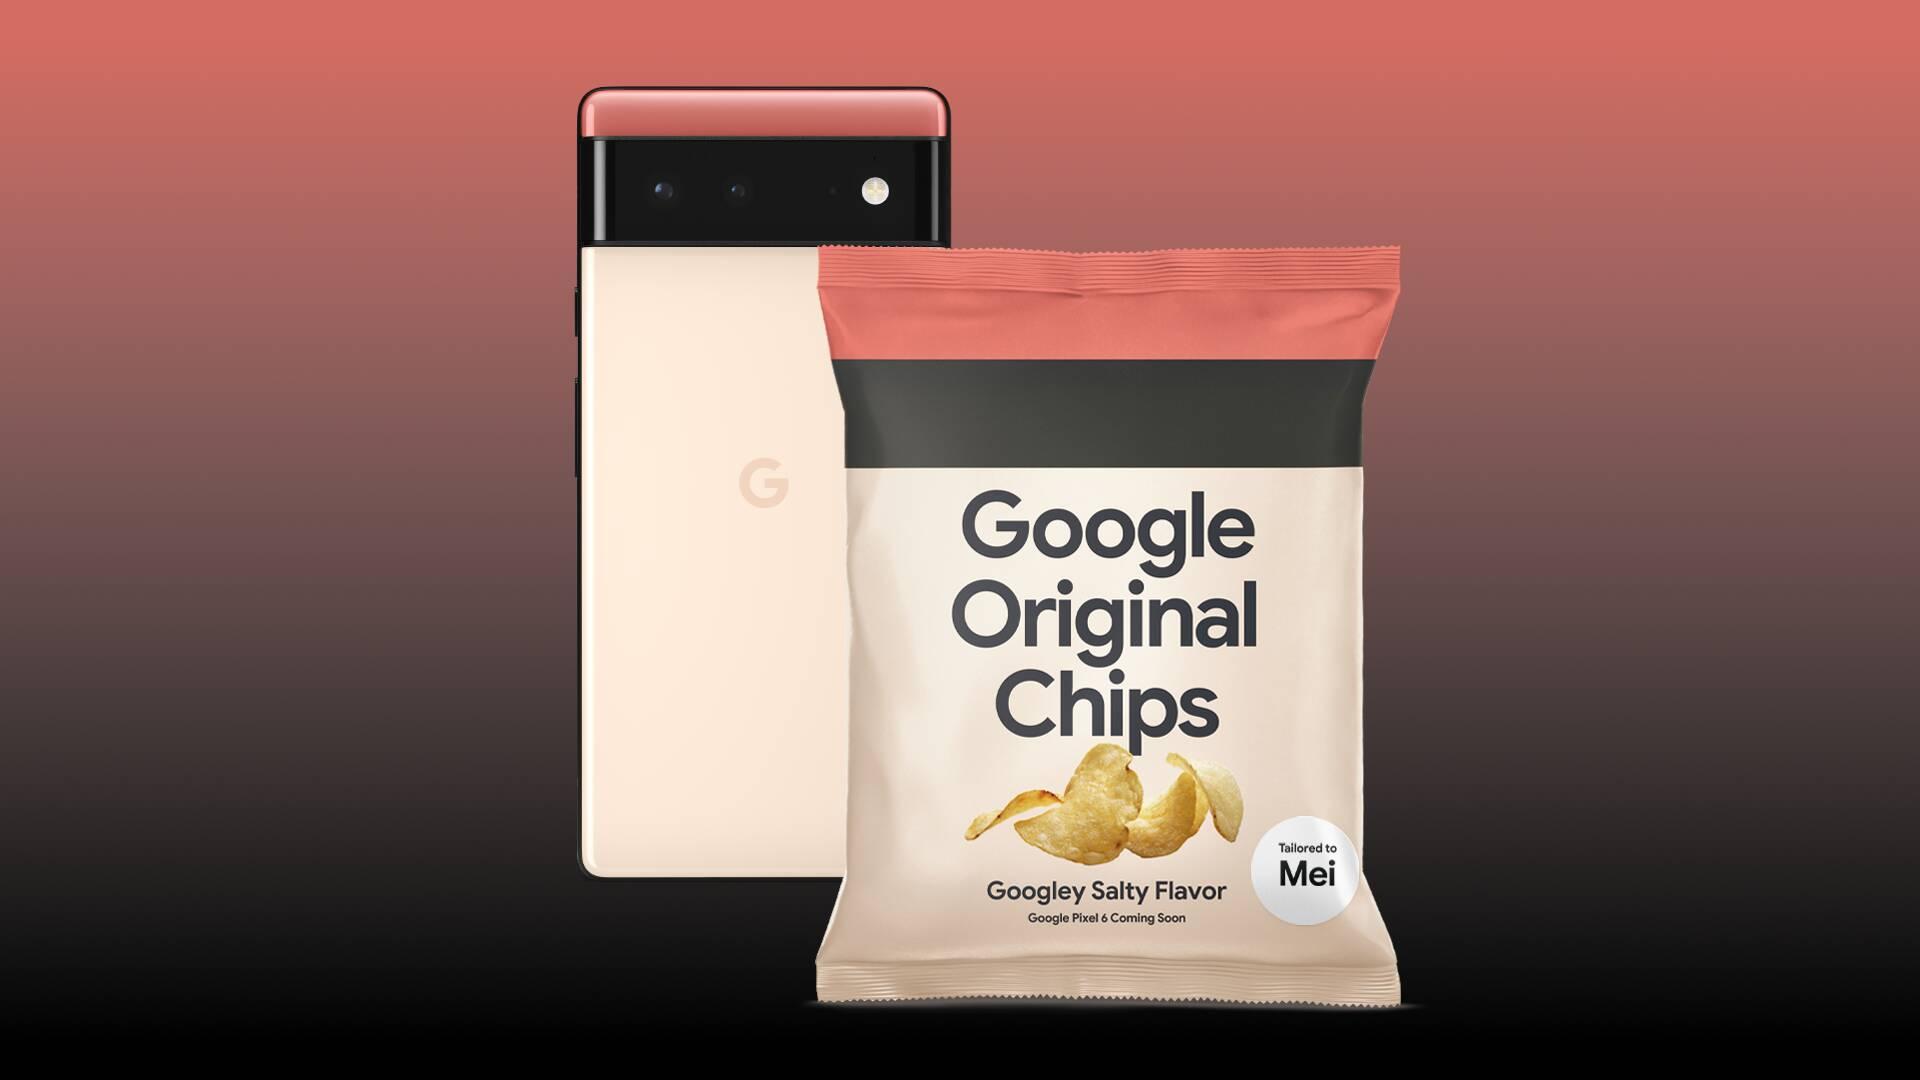 Google Original Chips - Pixel 6